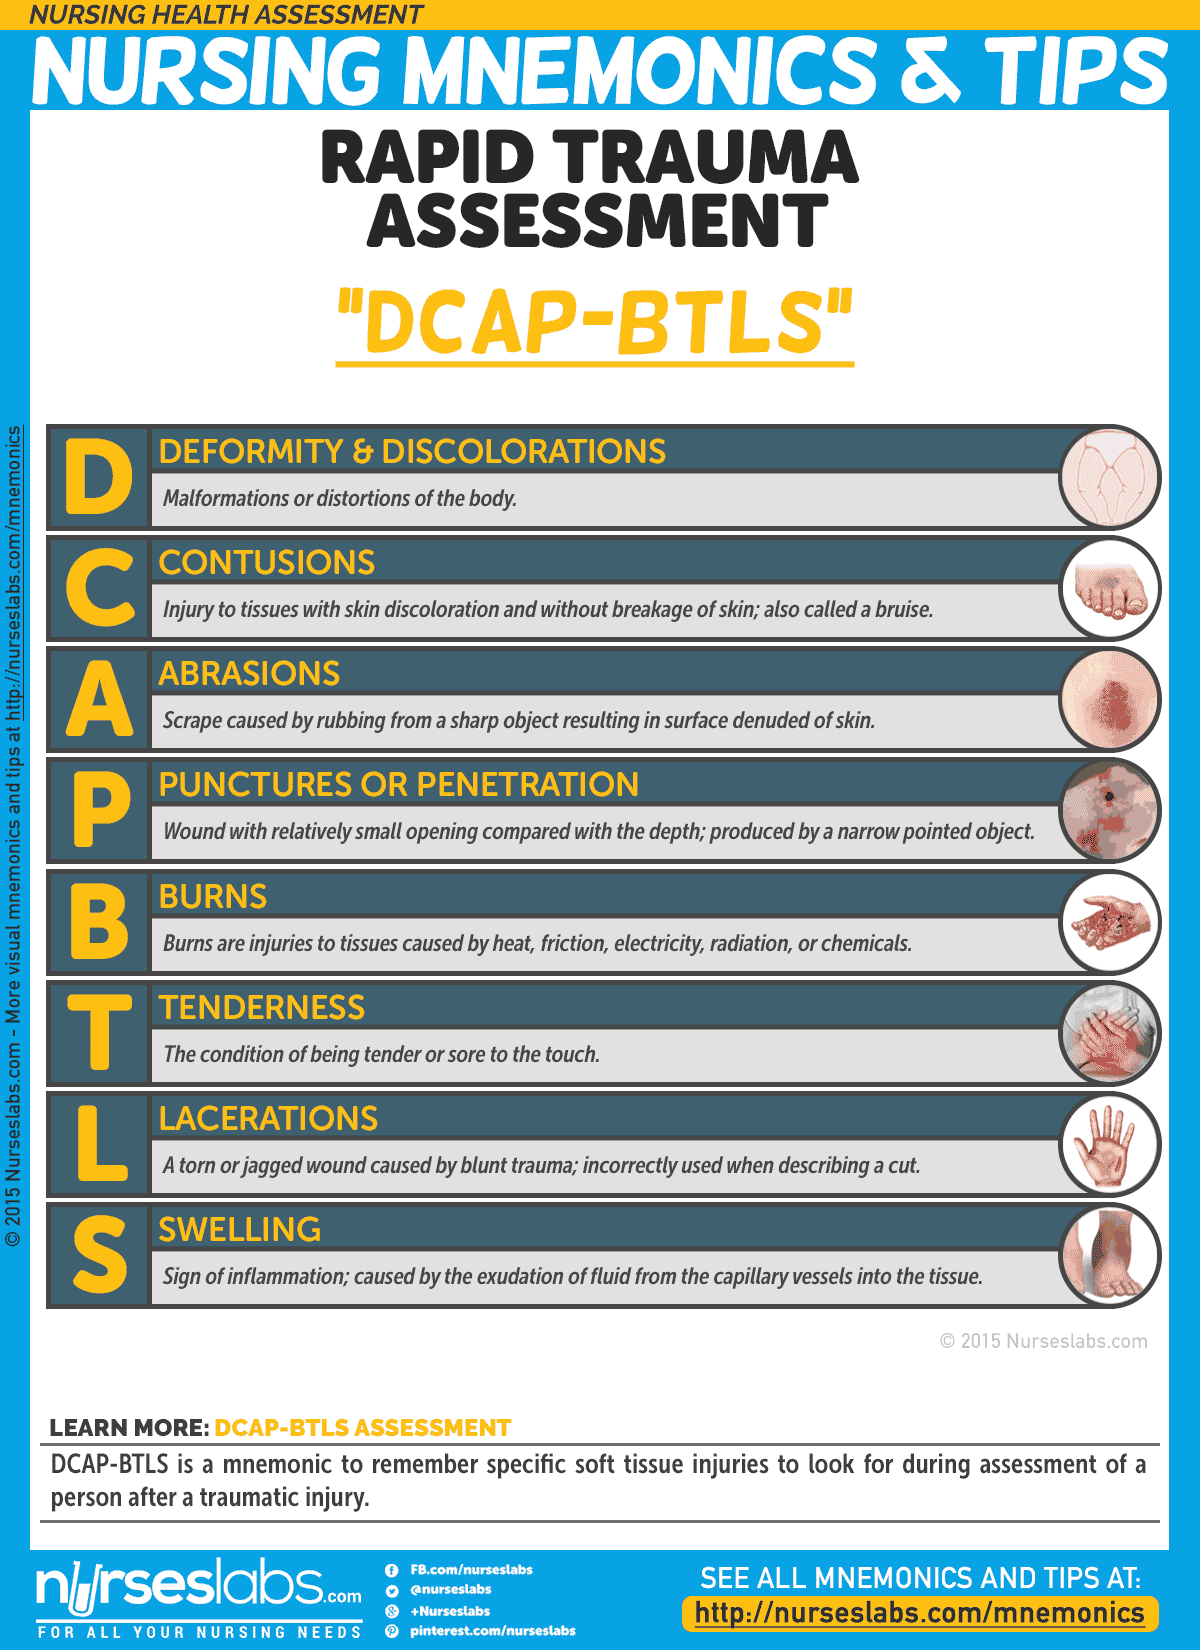 NHA-003: Rapid Trauma Assessment (DCAP-BTLS) Nursing Mnemonics & Tips